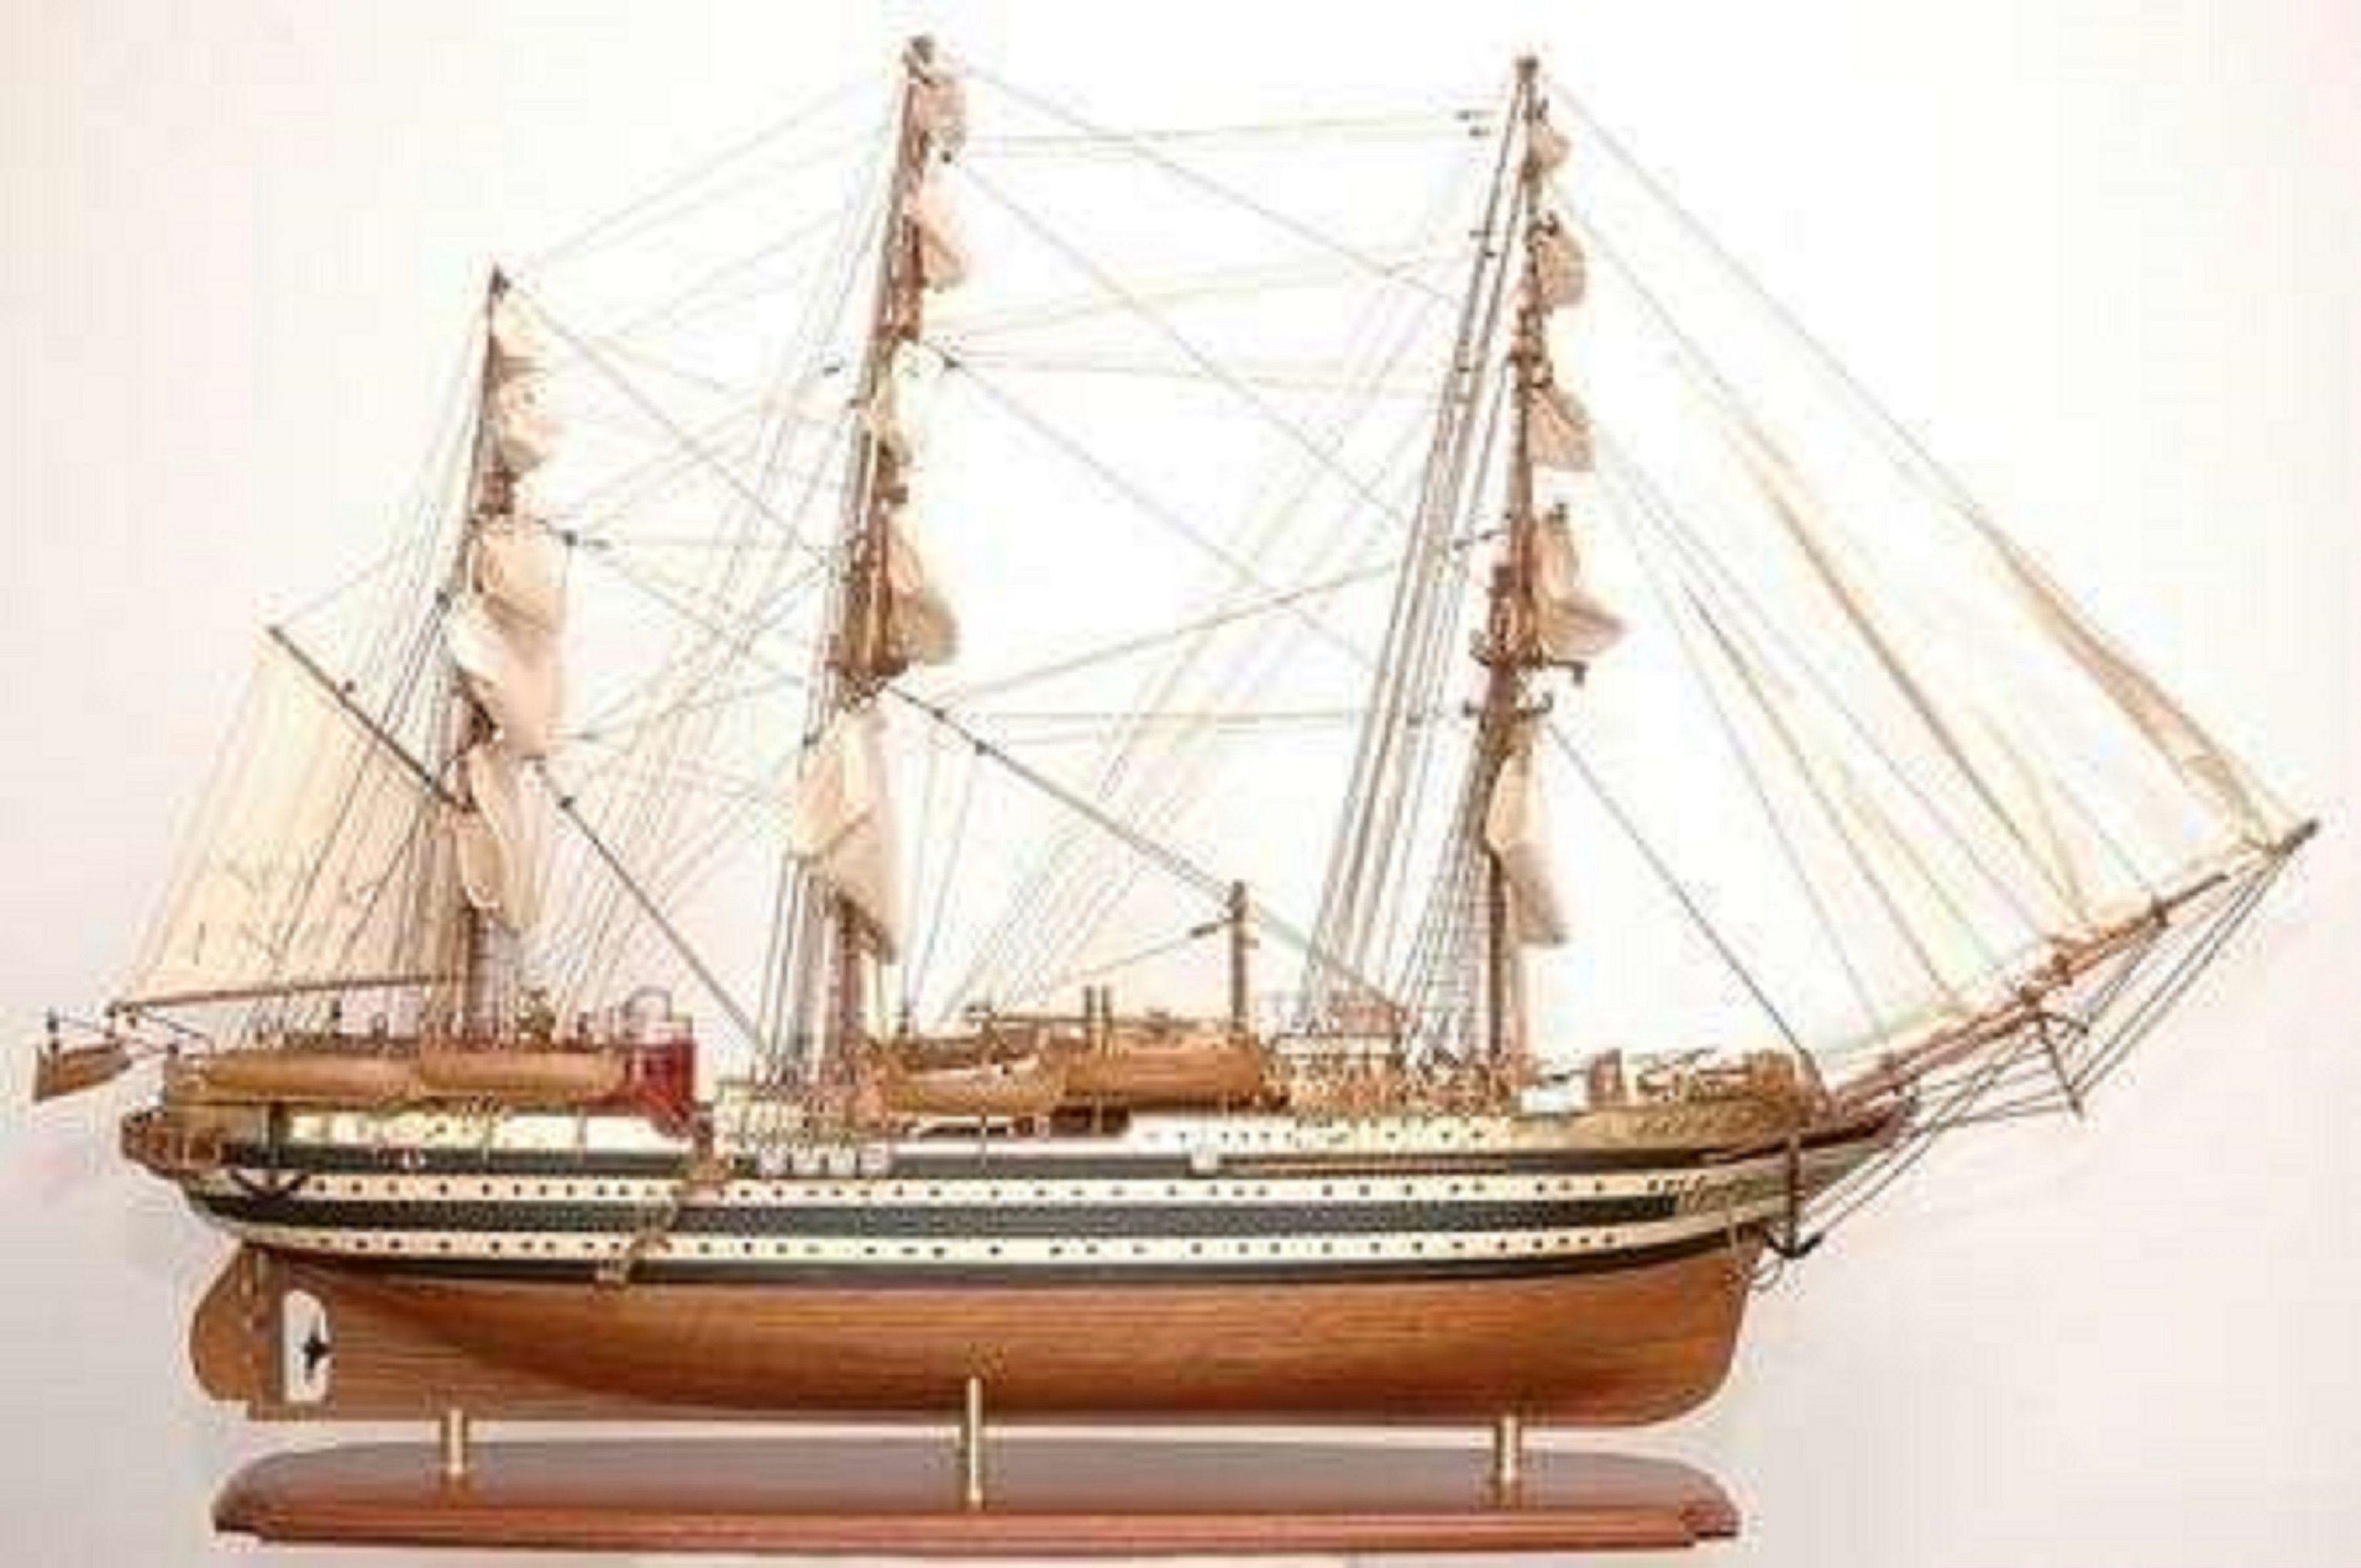 498-7770-Amerigo-Vespucci-Model-Ship-Superior-Range